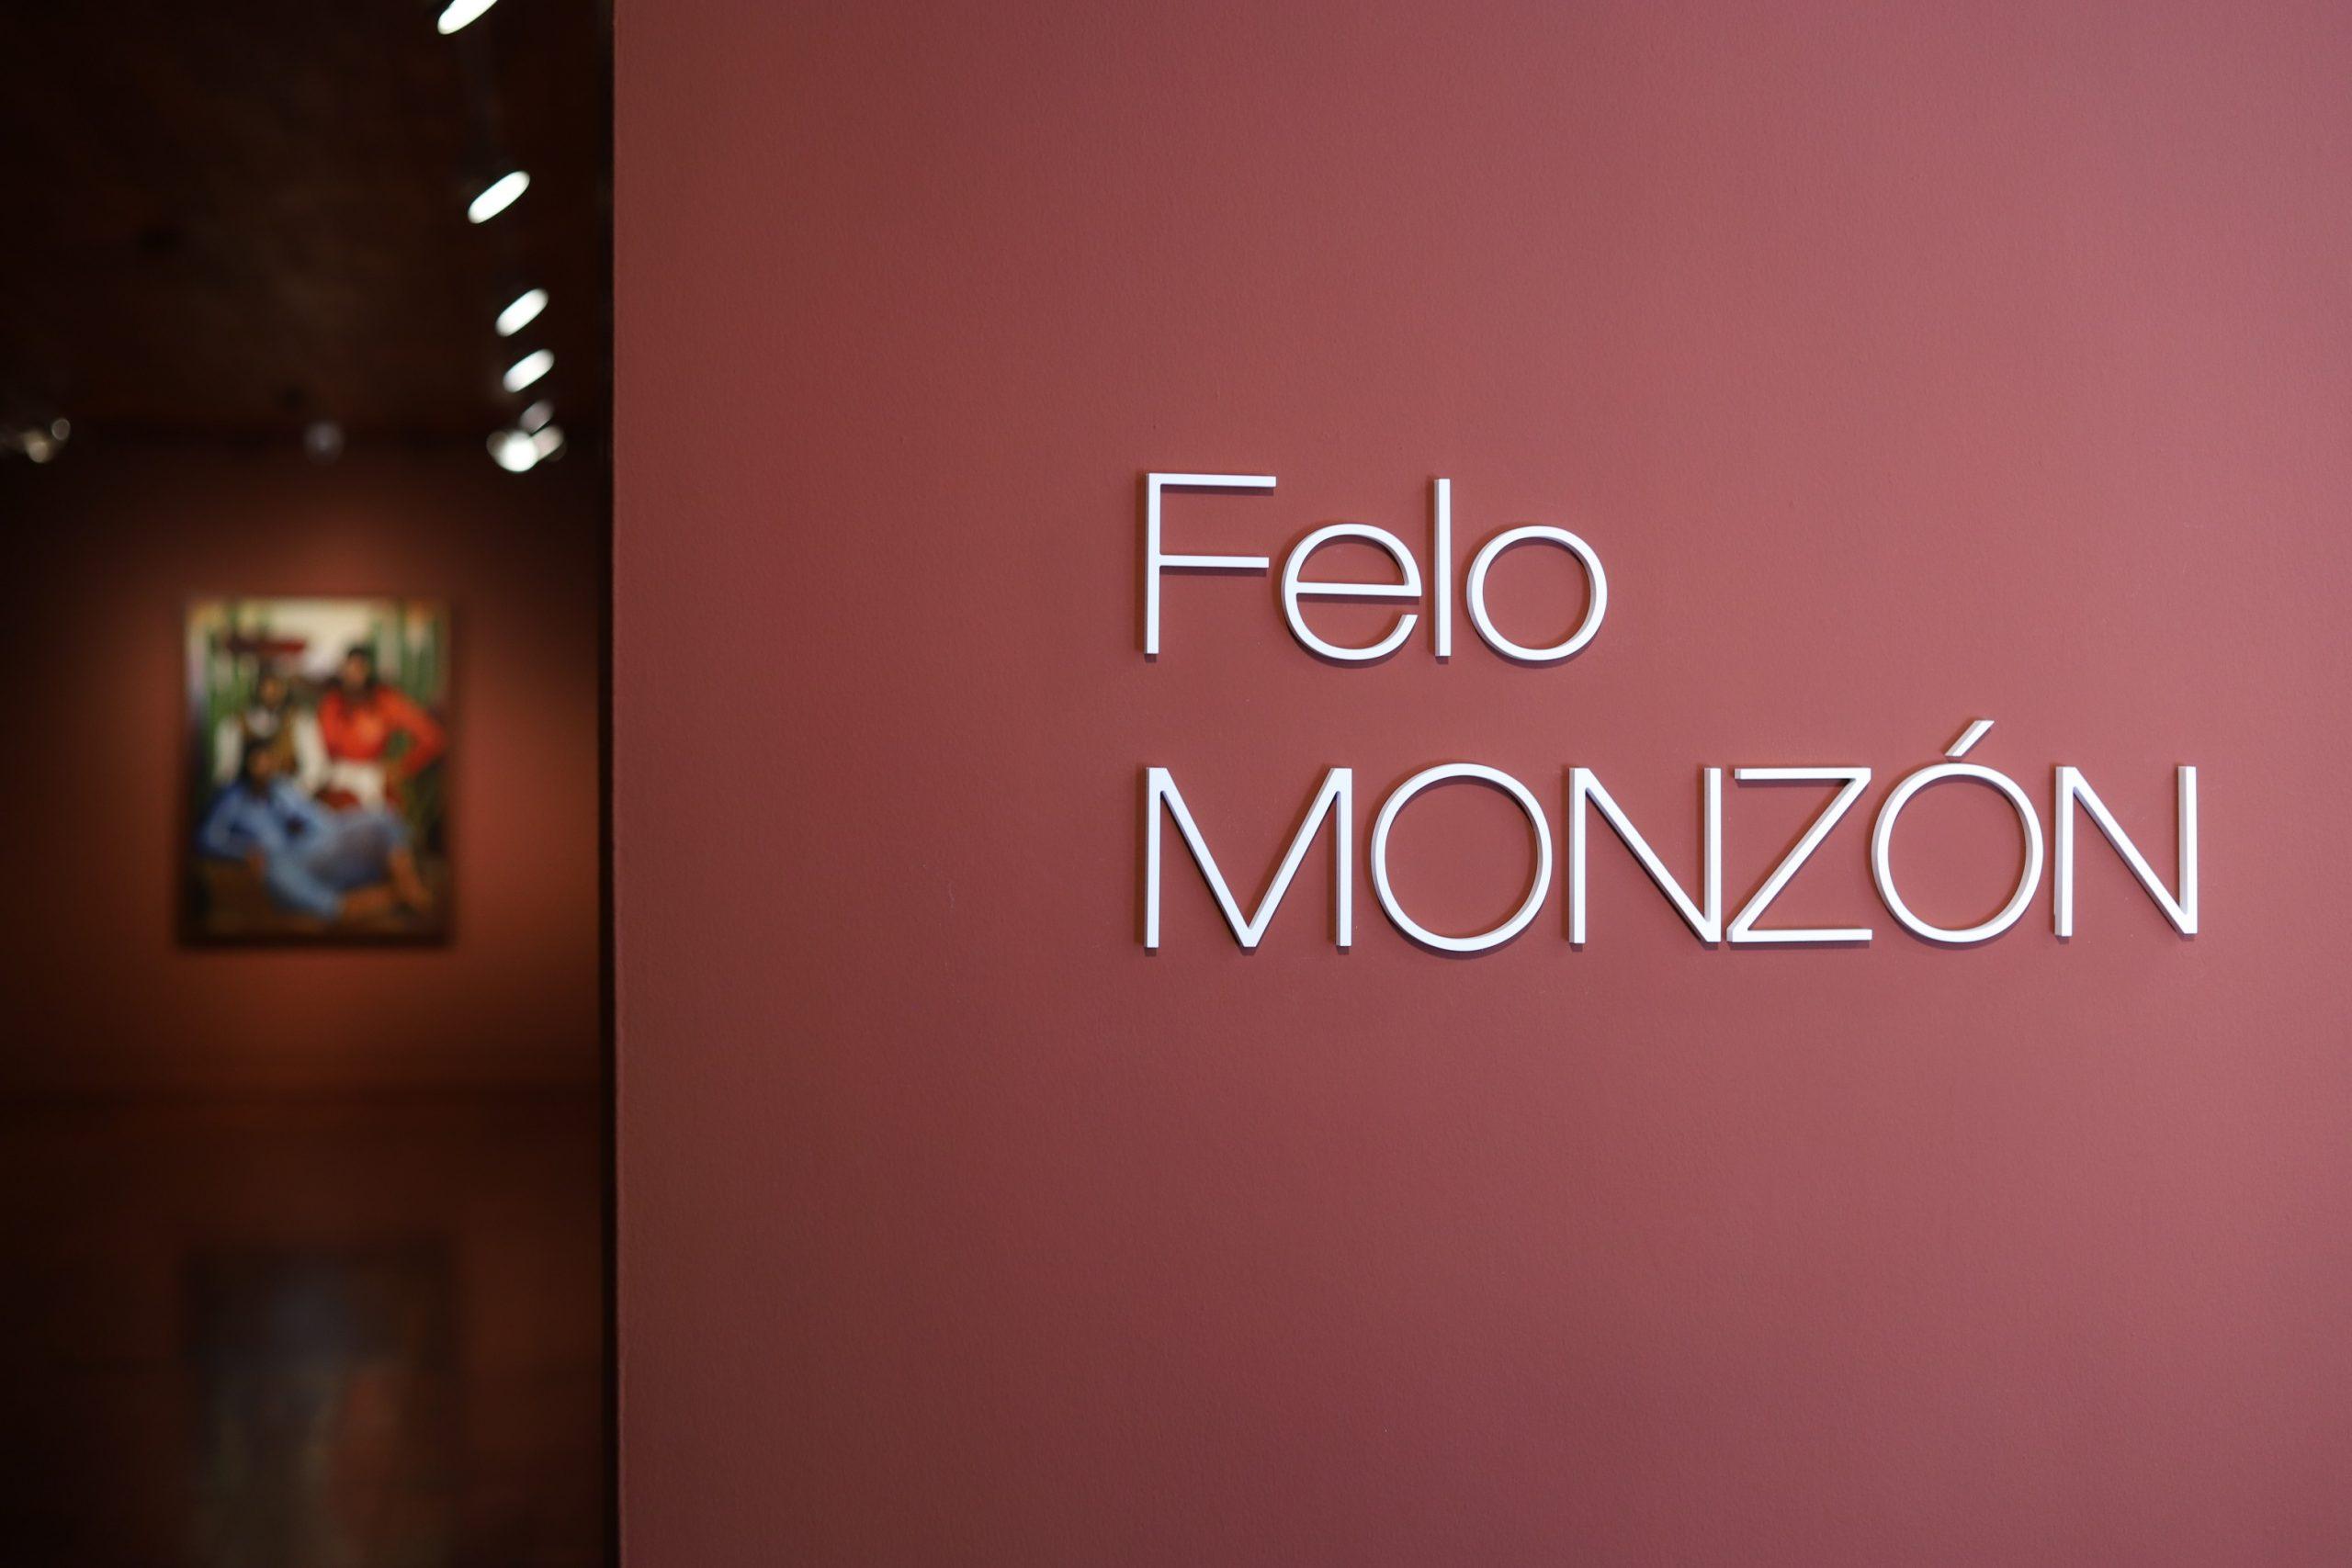 Felo Monzon 3 scaled